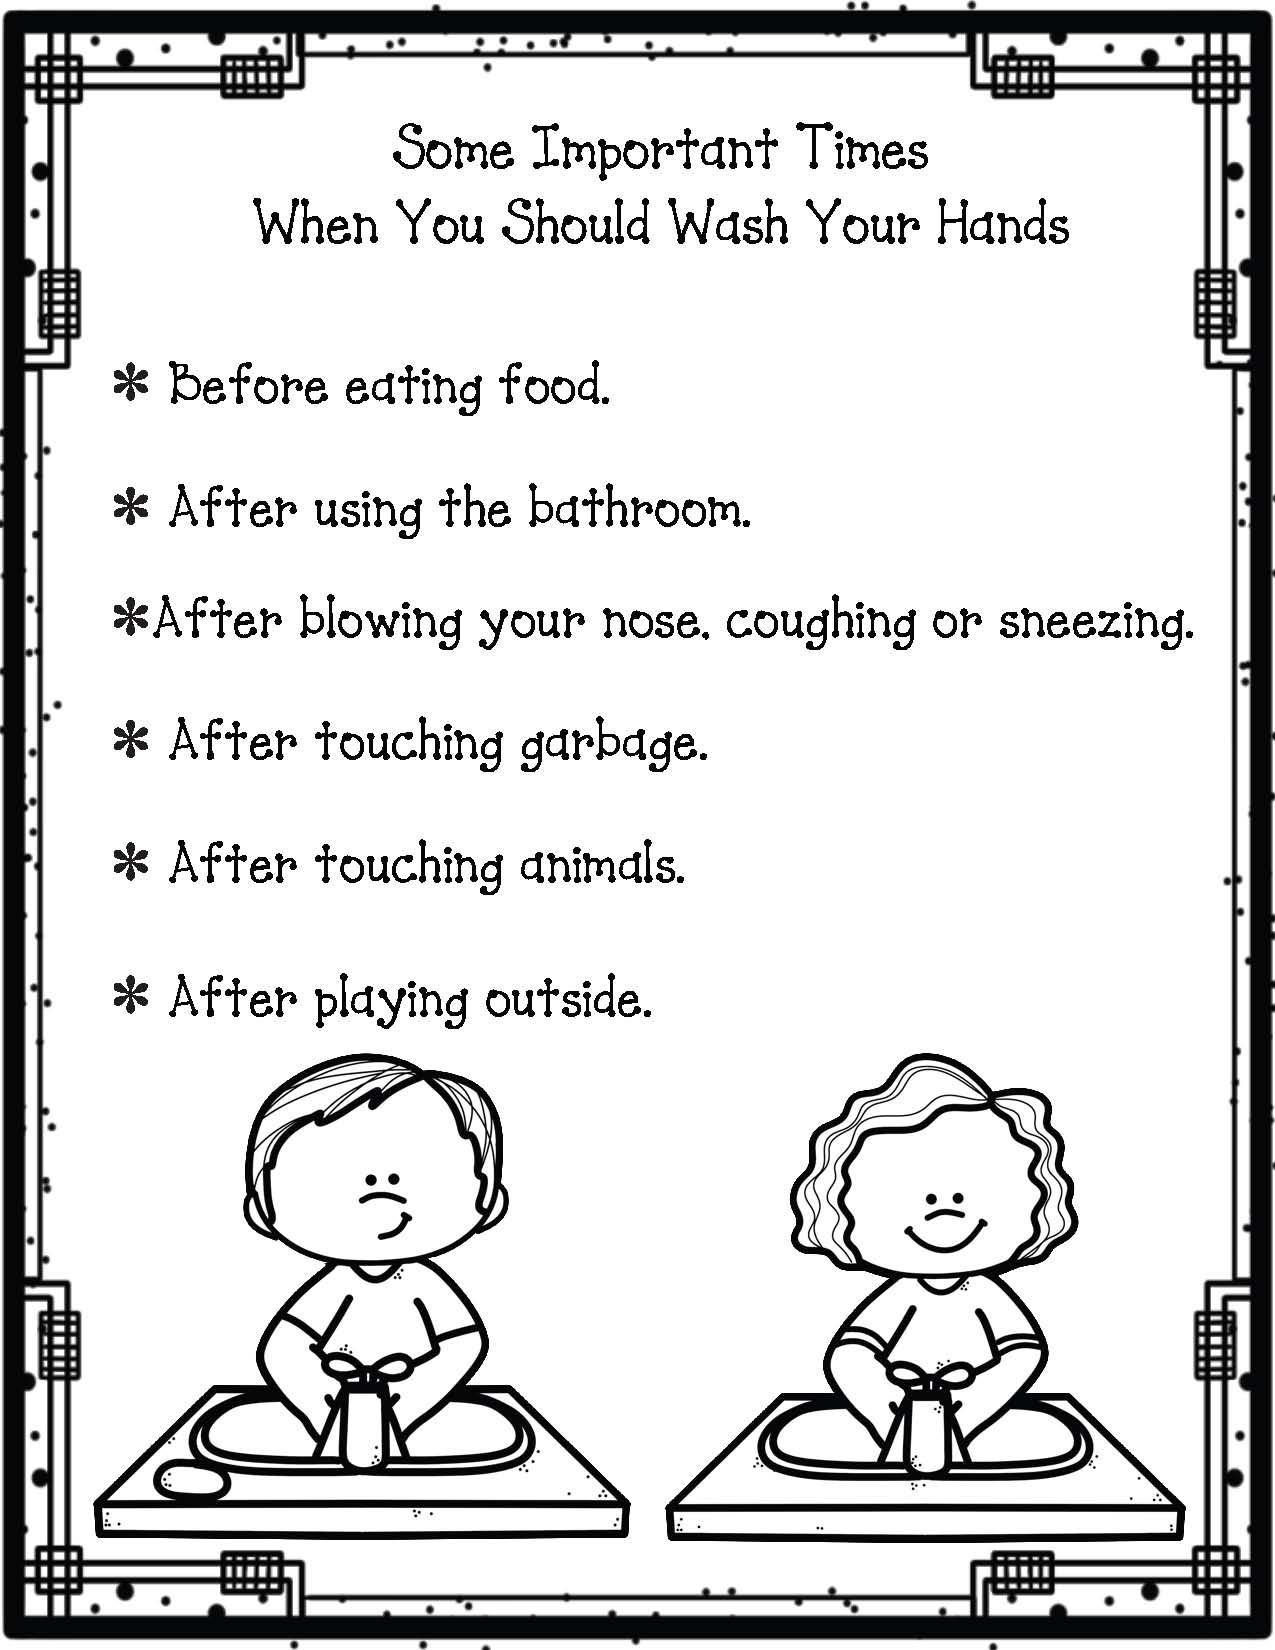 Bathroom Worksheets For Kindergarten Worksheets Are A Cruci In 2021 Kindergarten Worksheets Printable Kindergarten Worksheets Handwriting Worksheets For Kindergarten Importance of water worksheets